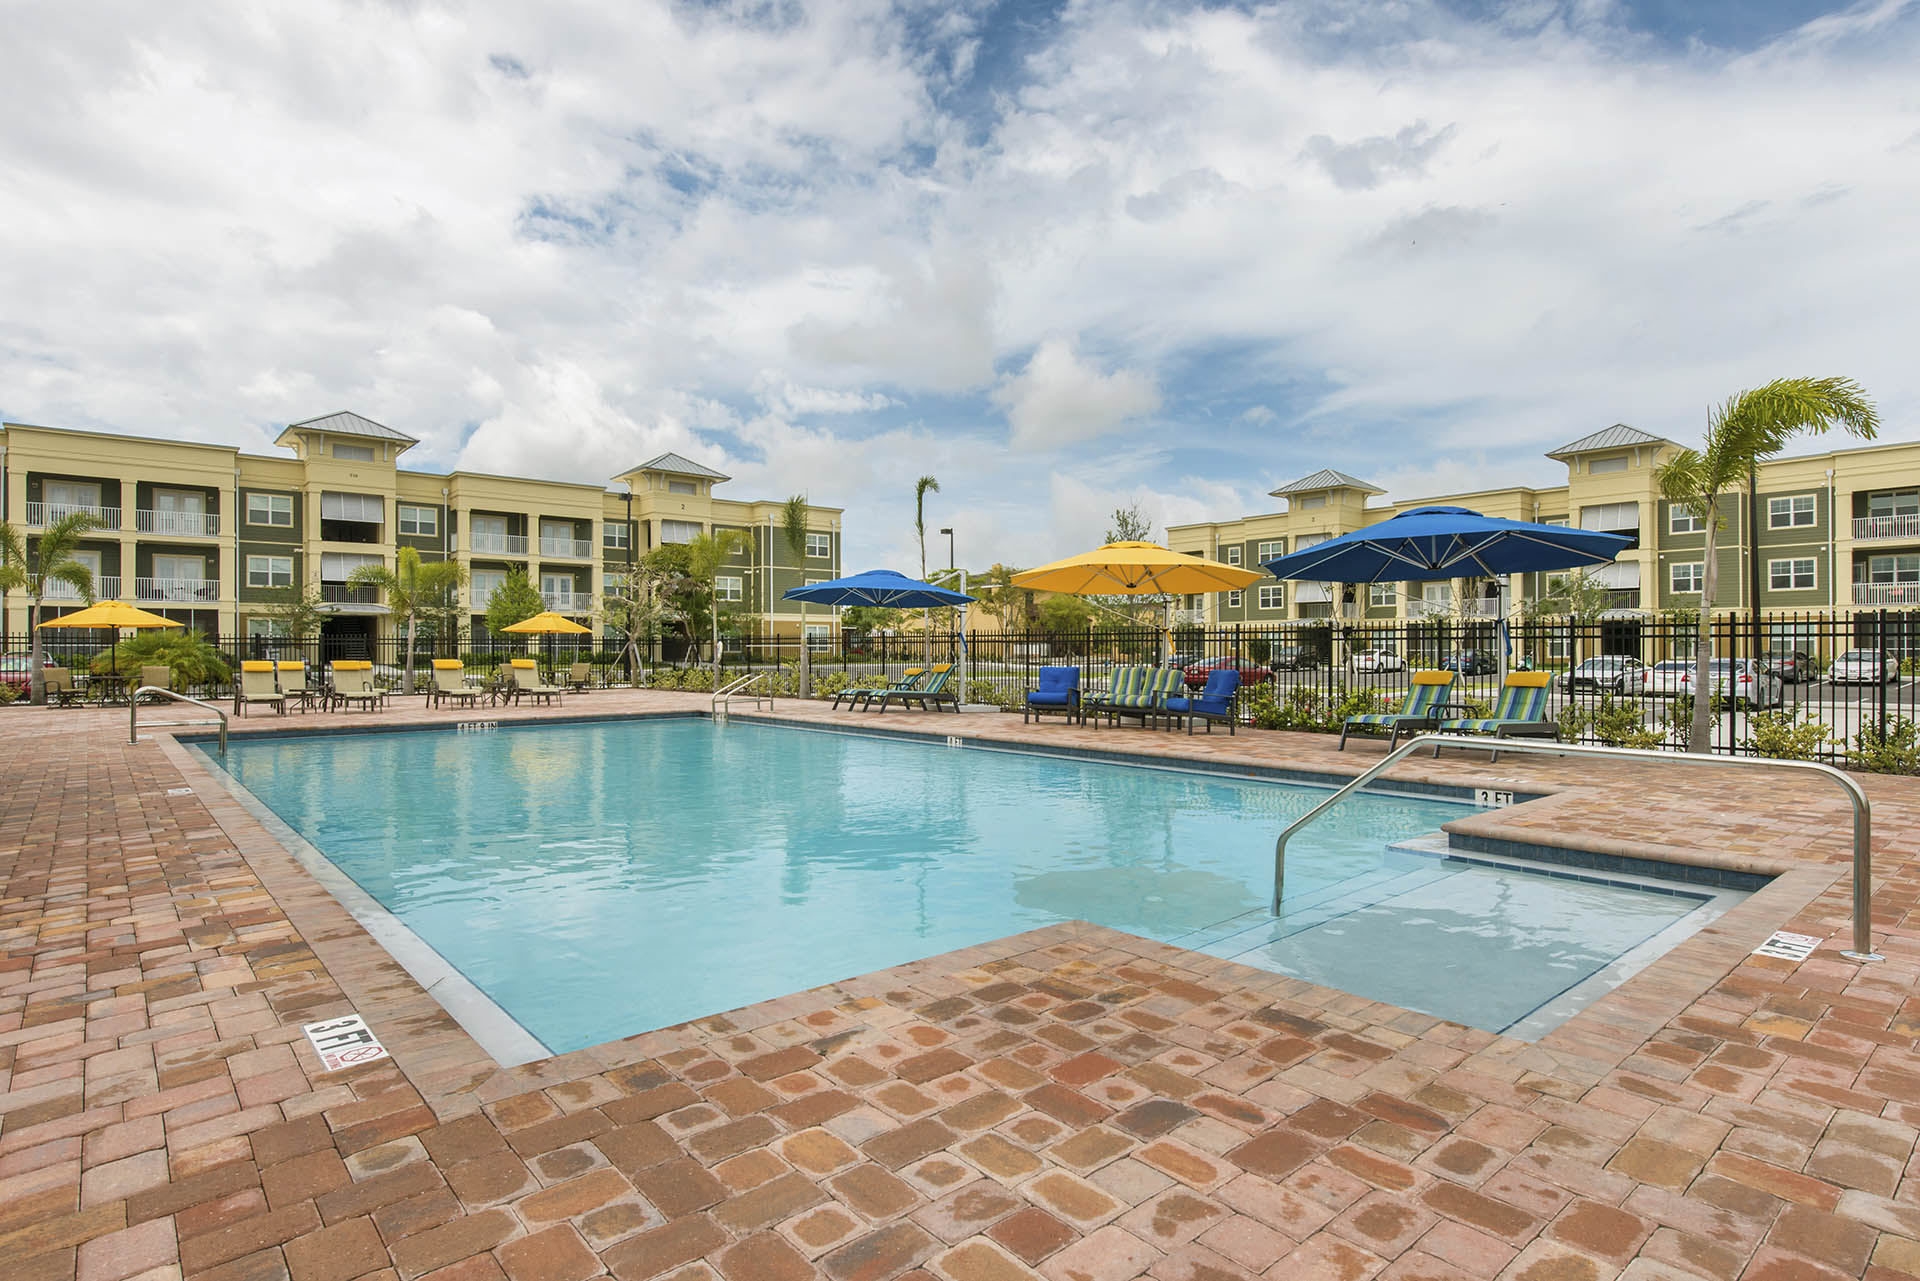 4530 PINEBROOK CIRCLE - Bradenton, FL apartments for rent